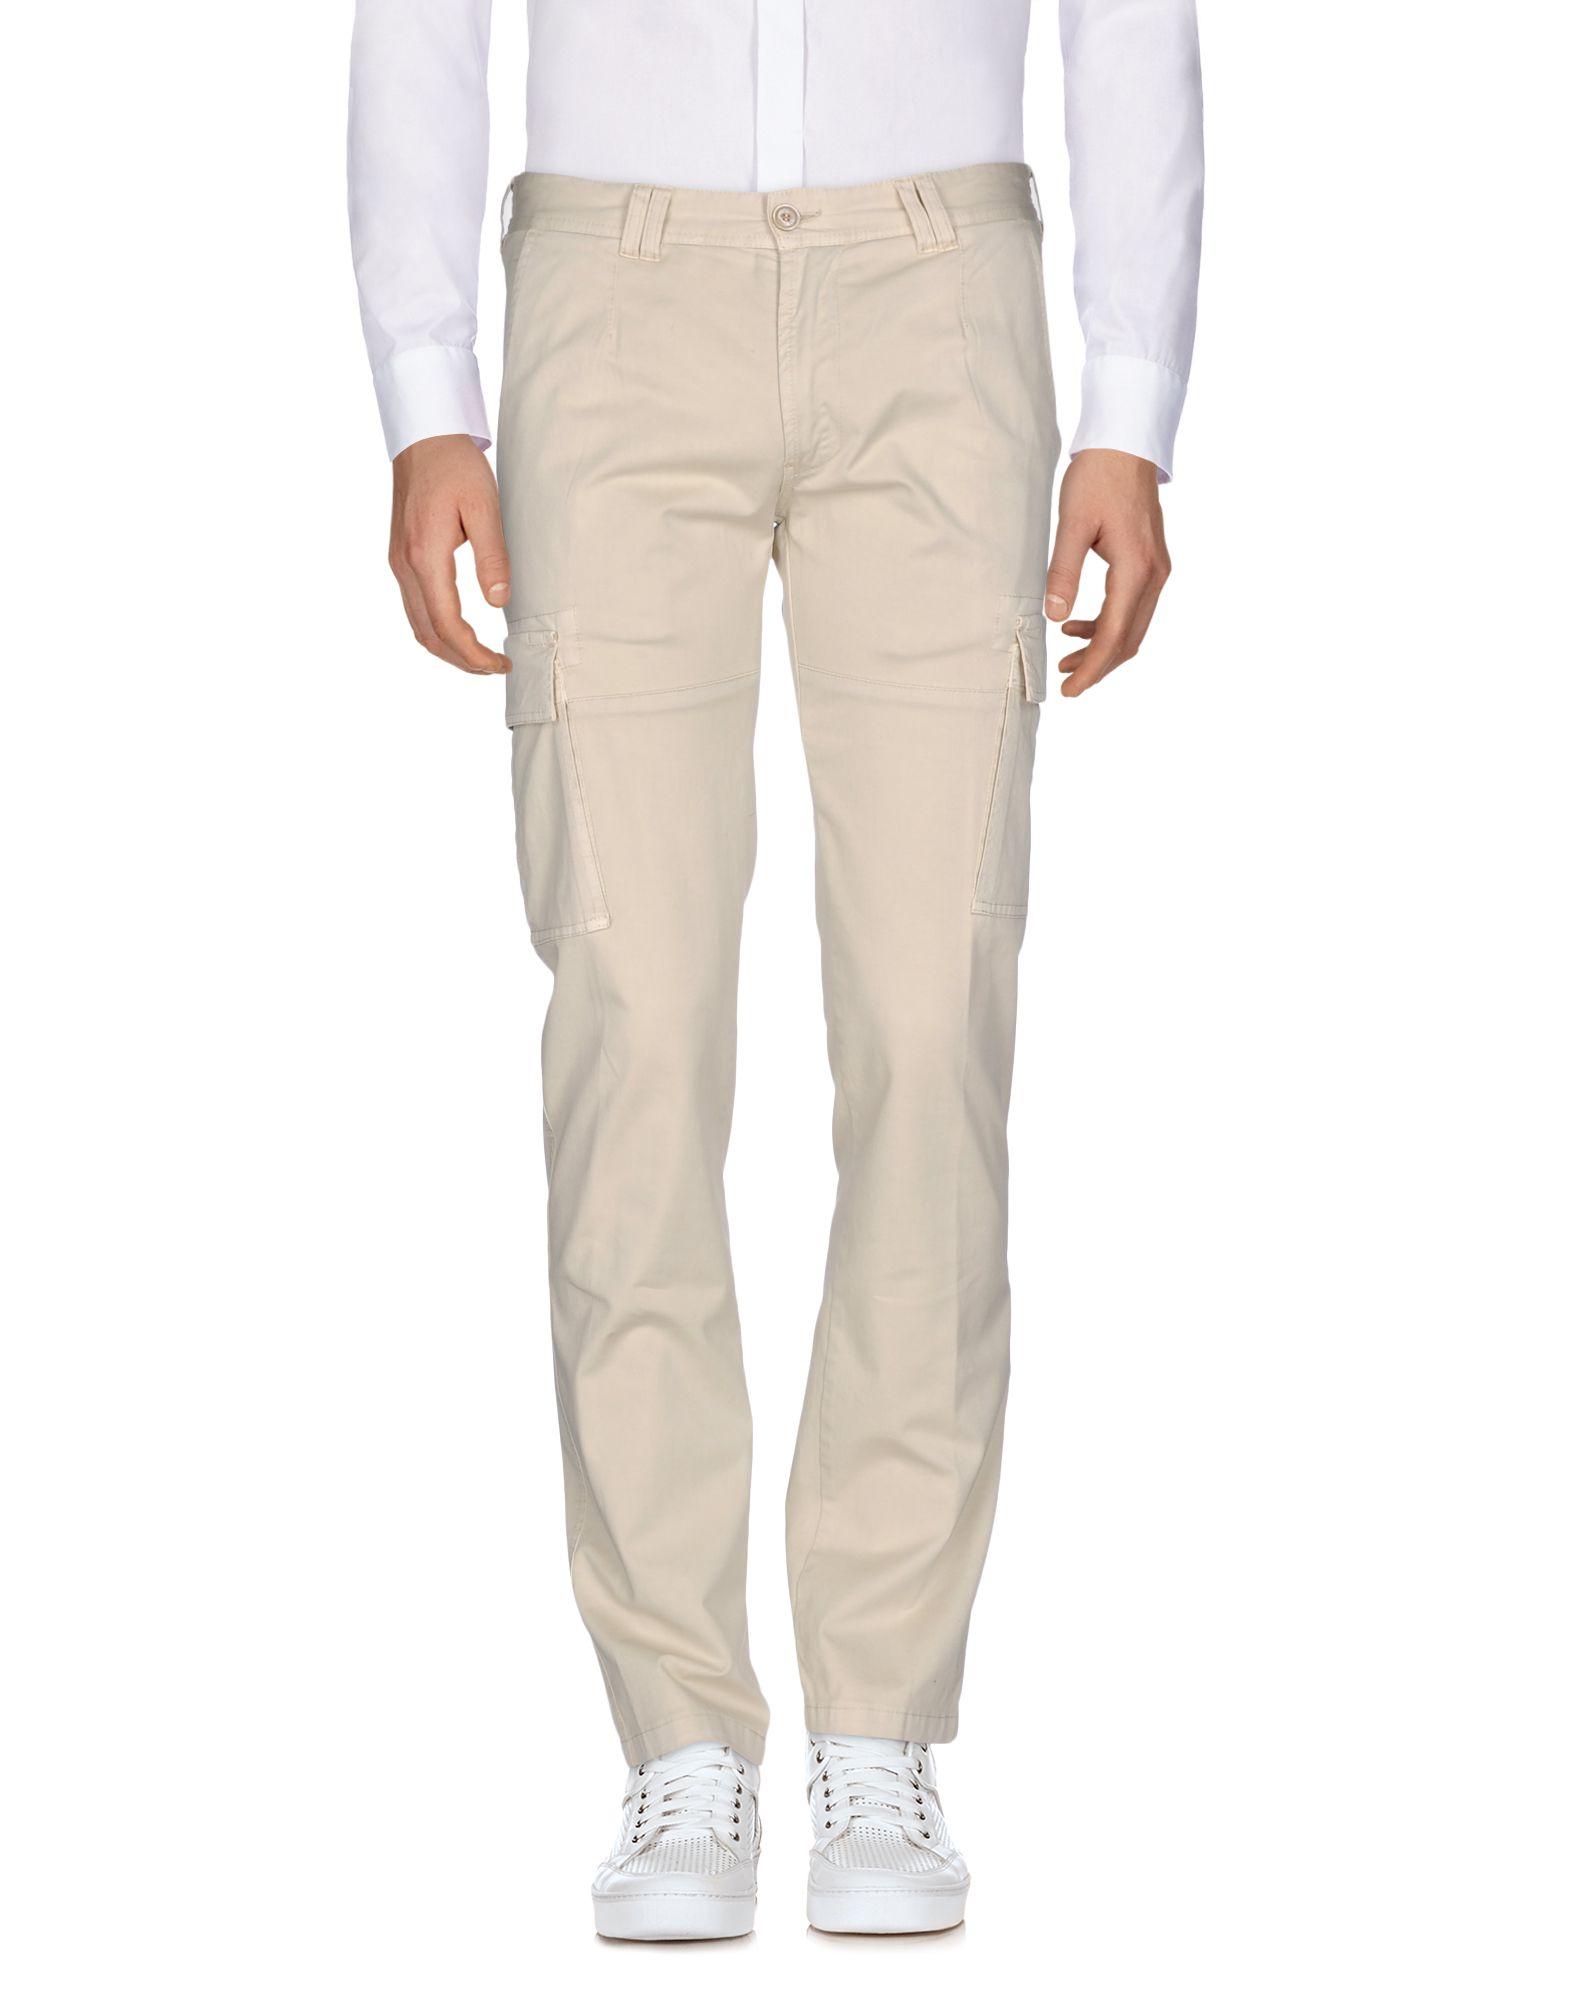 MASSIMO REBECCHI Повседневные брюки massimo rebecchi tdm повседневные брюки